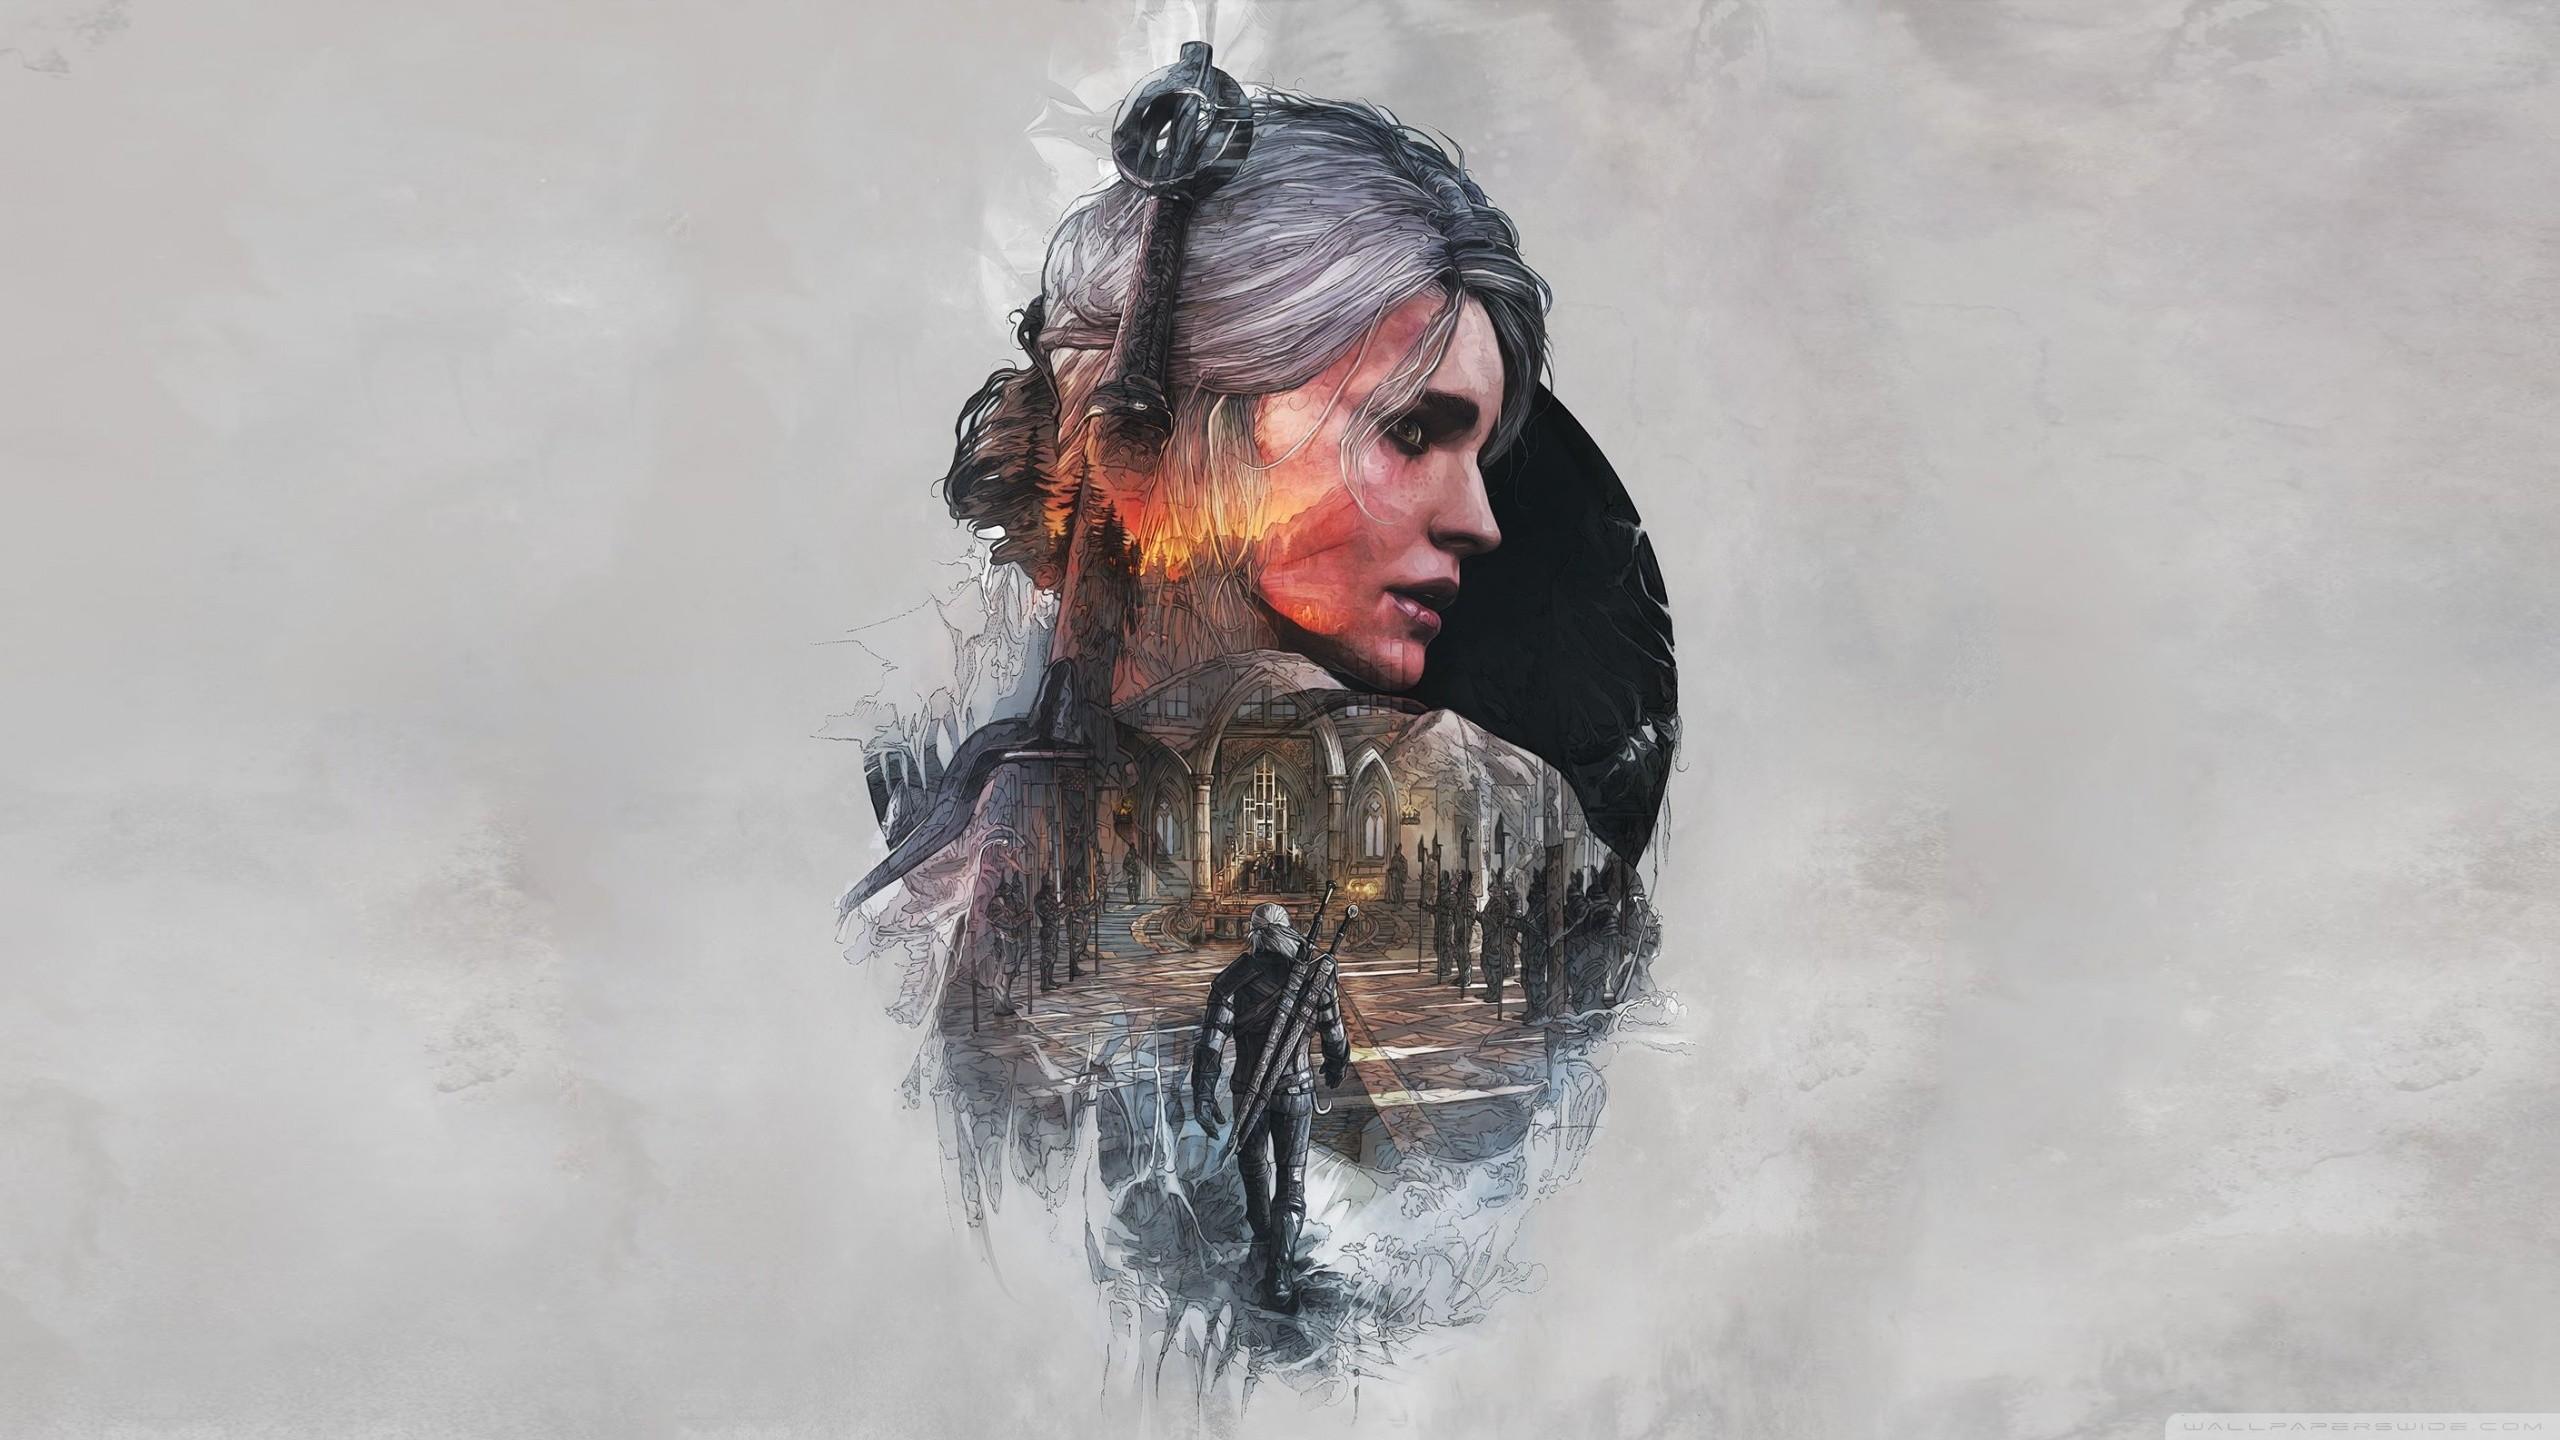 The Witcher 3 Wild Hunt Ciri FanArt HD Wide Wallpaper for Widescreen